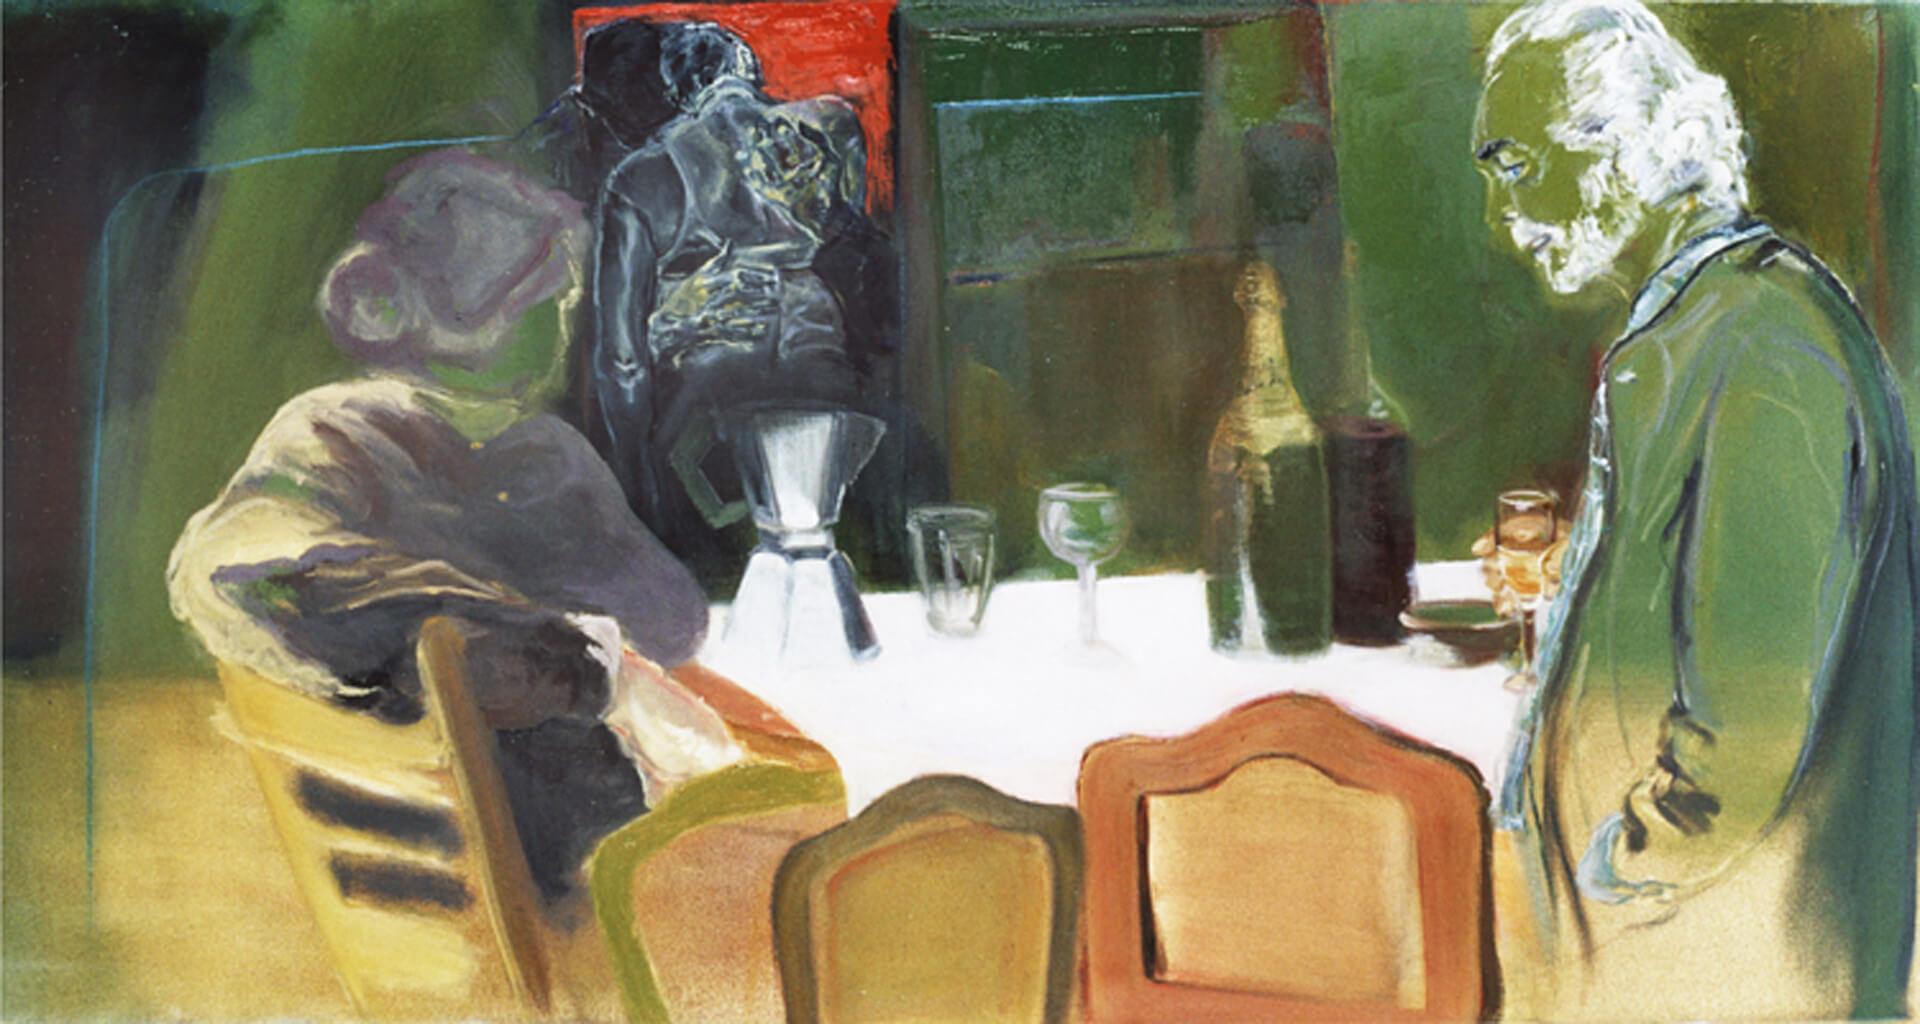 2007 - Oil on canvas. 70 cm. x 180 cm.